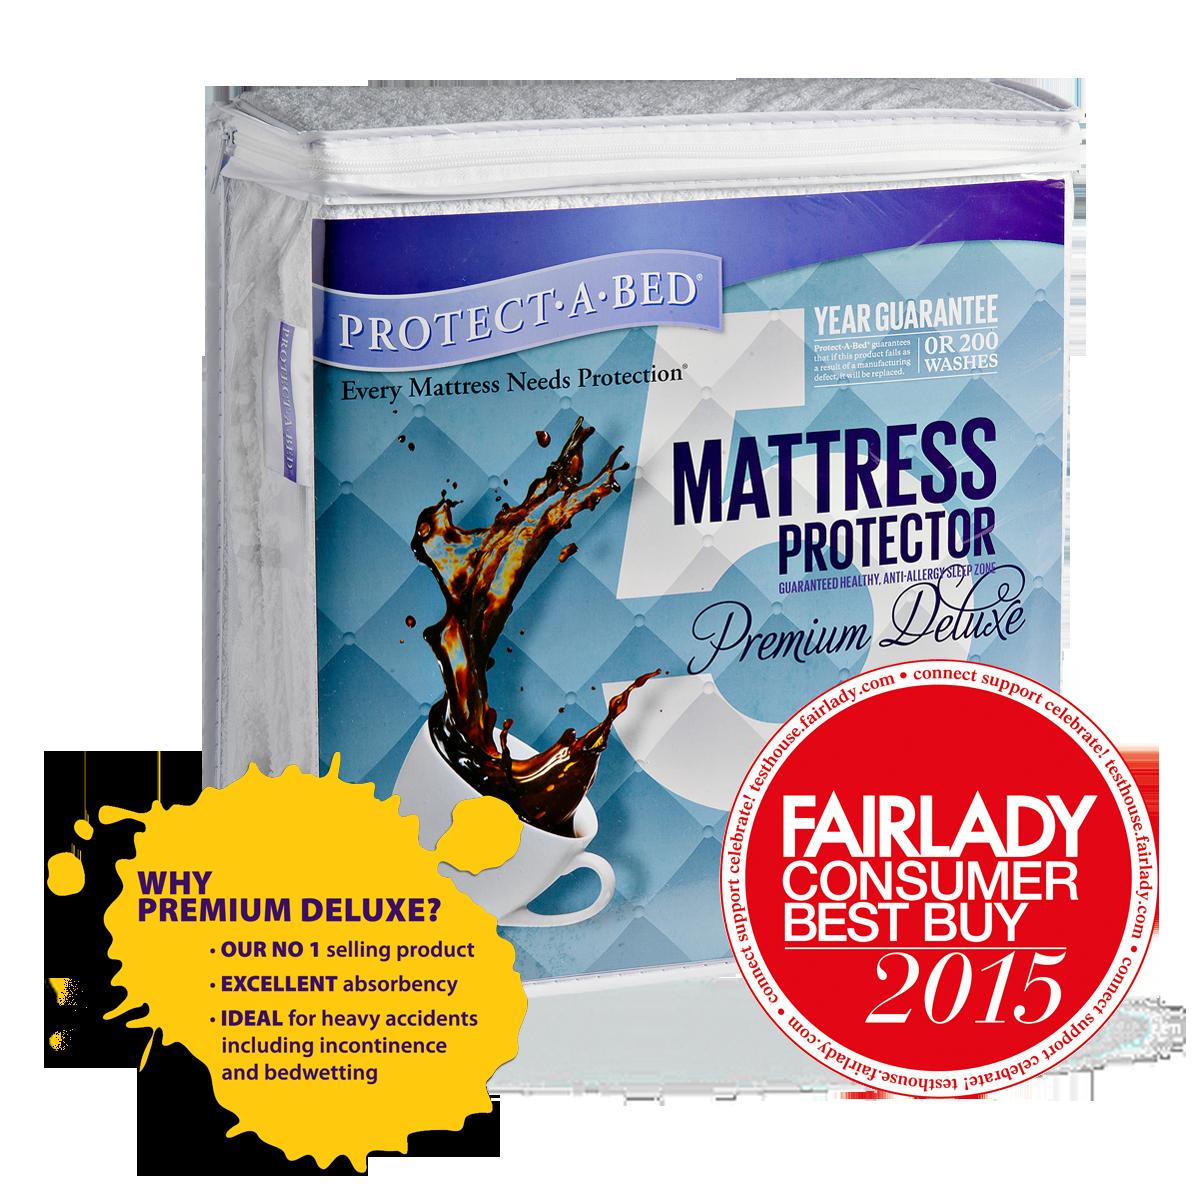 Premium Deluxe Mattress